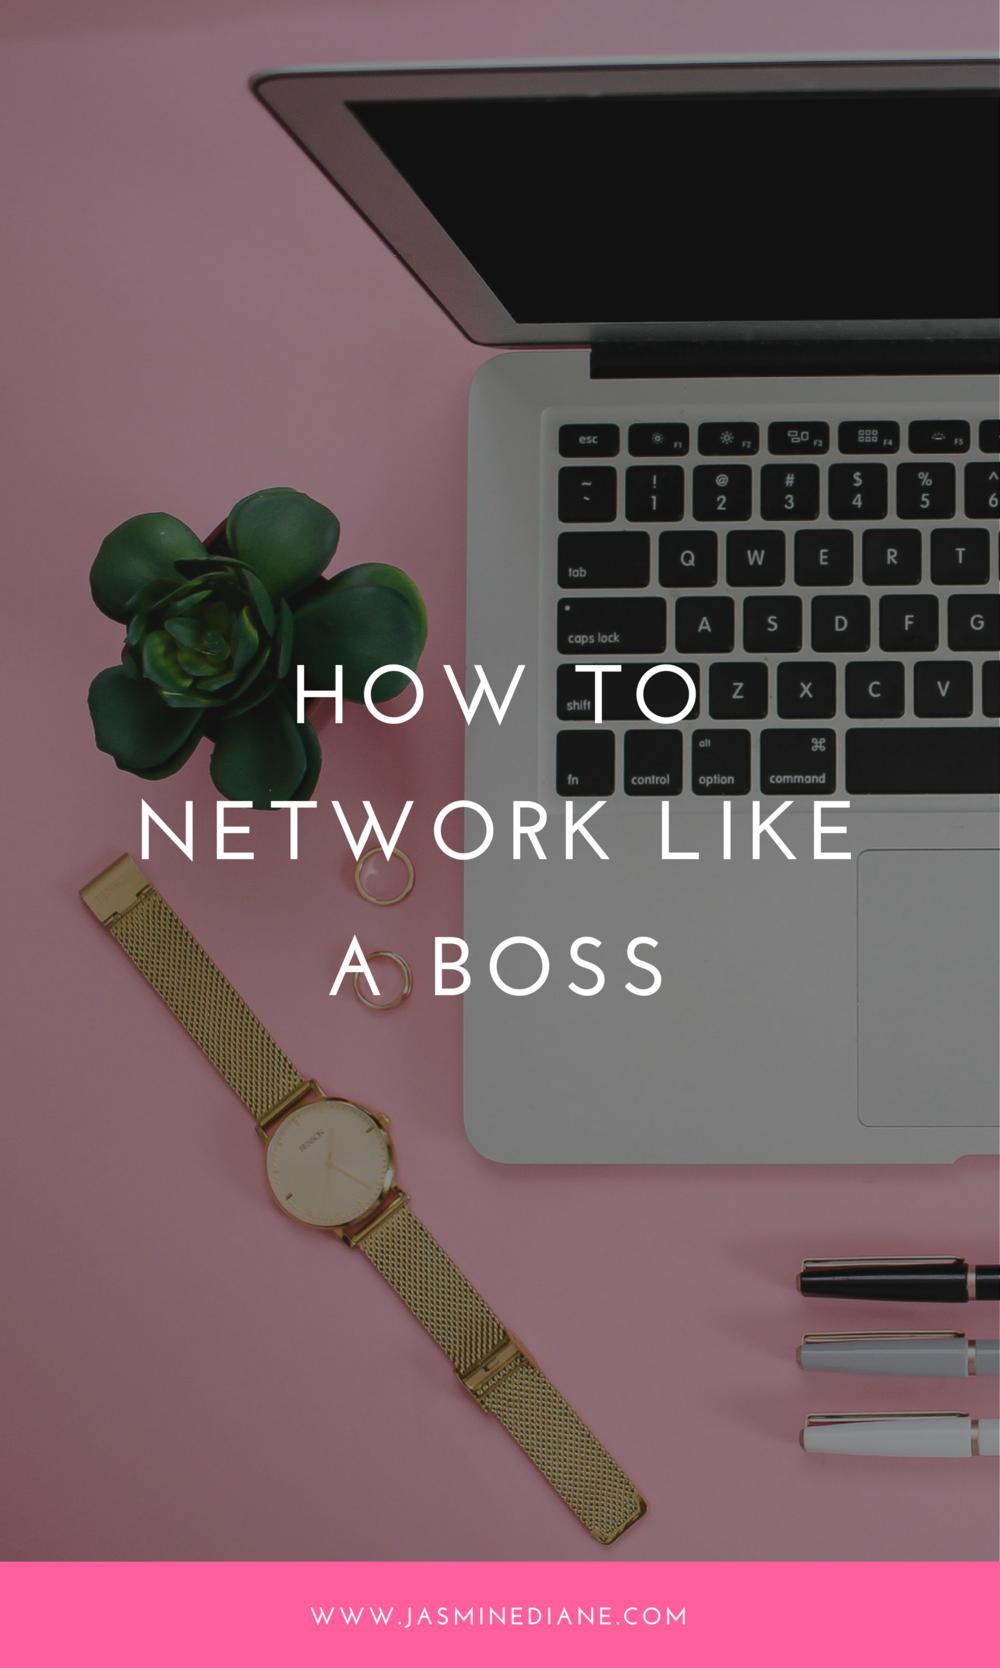 how do i network?